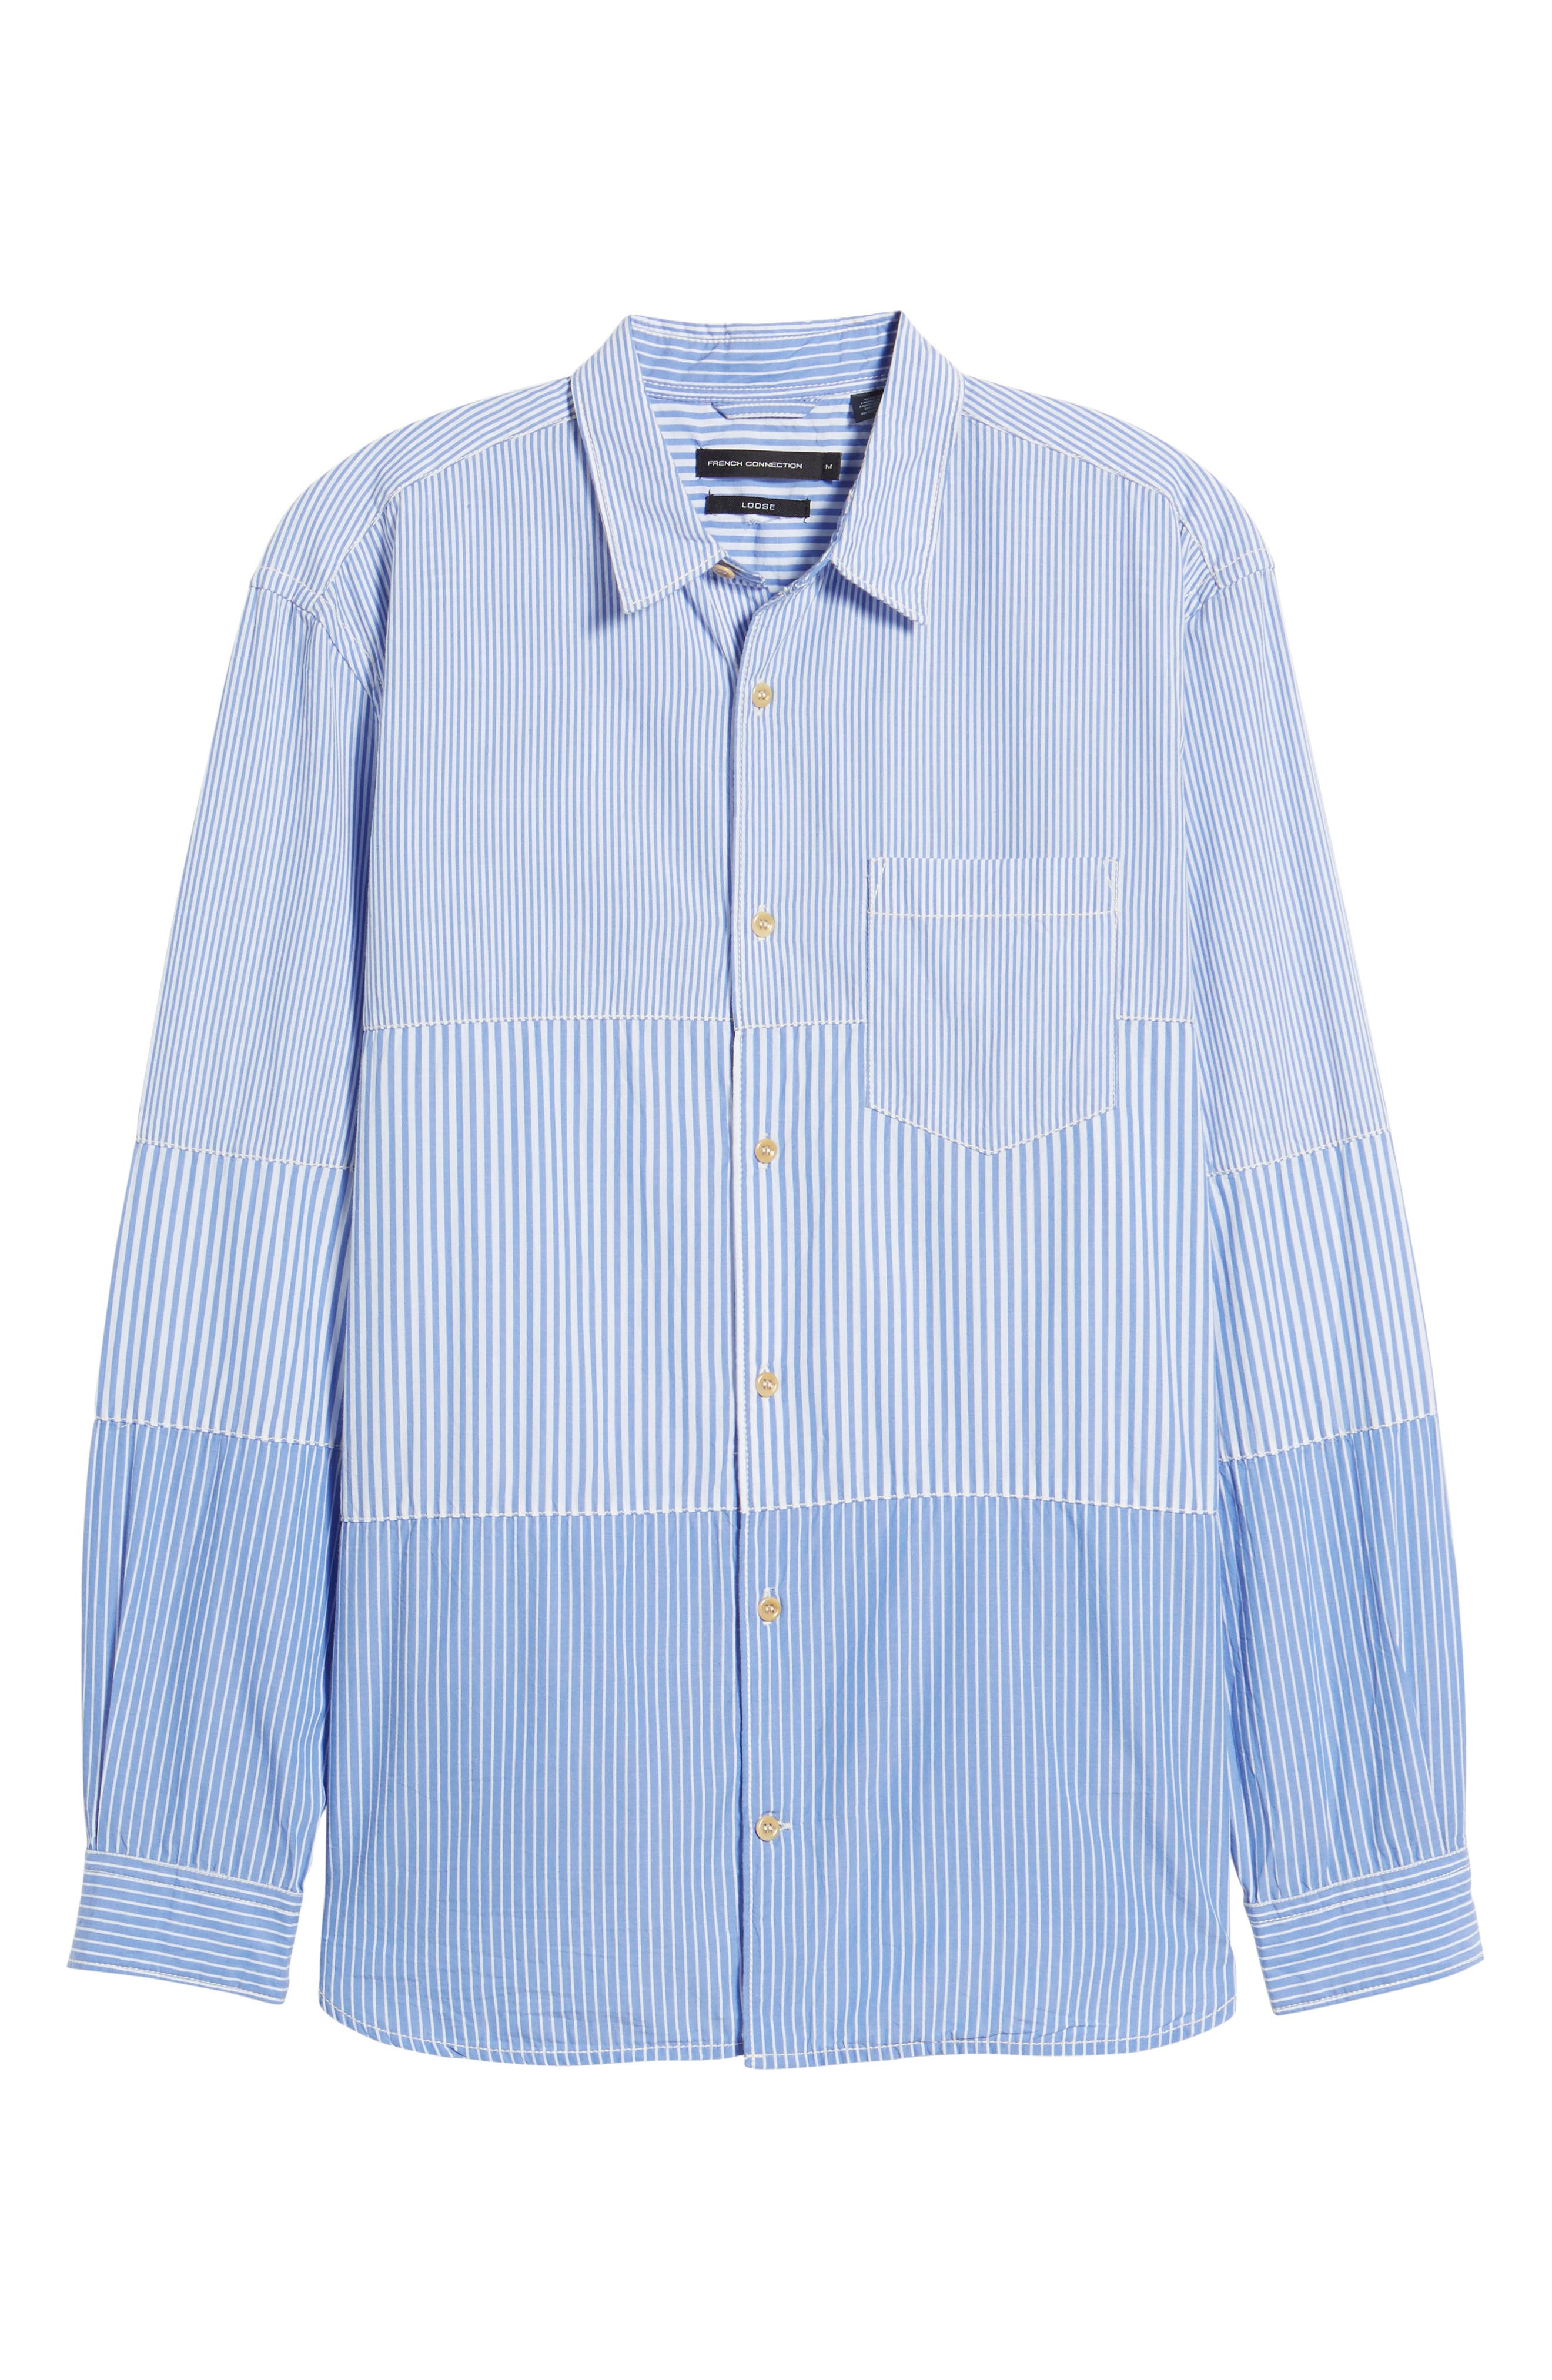 Regular Fit Stripe Sport Shirt,                             Alternate thumbnail 6, color,                             400